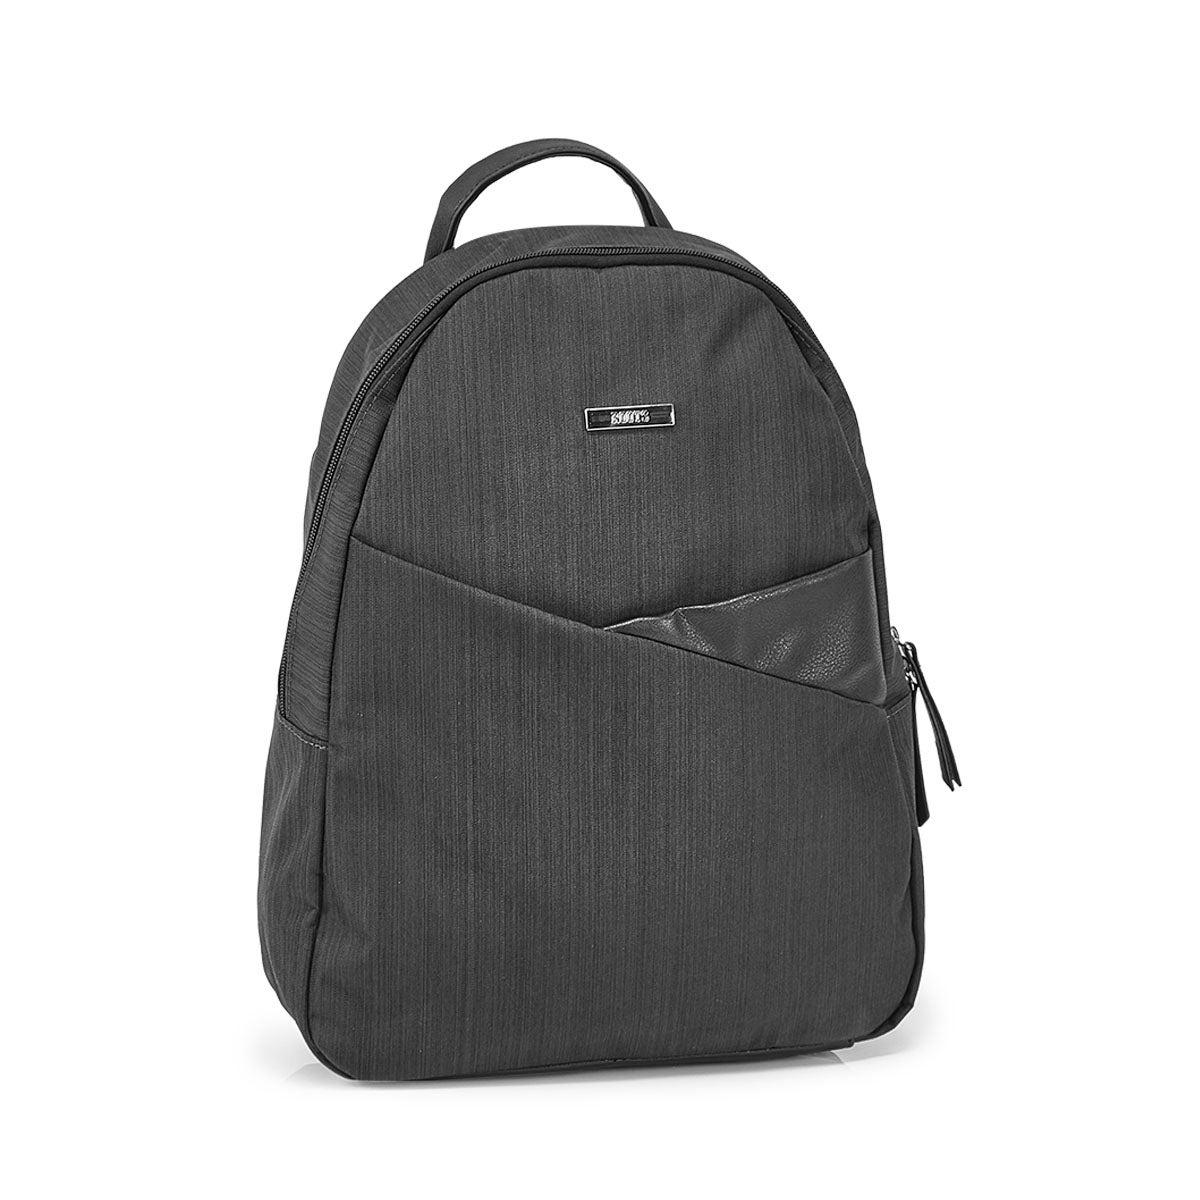 Women's R5796 Mini backpack - Black